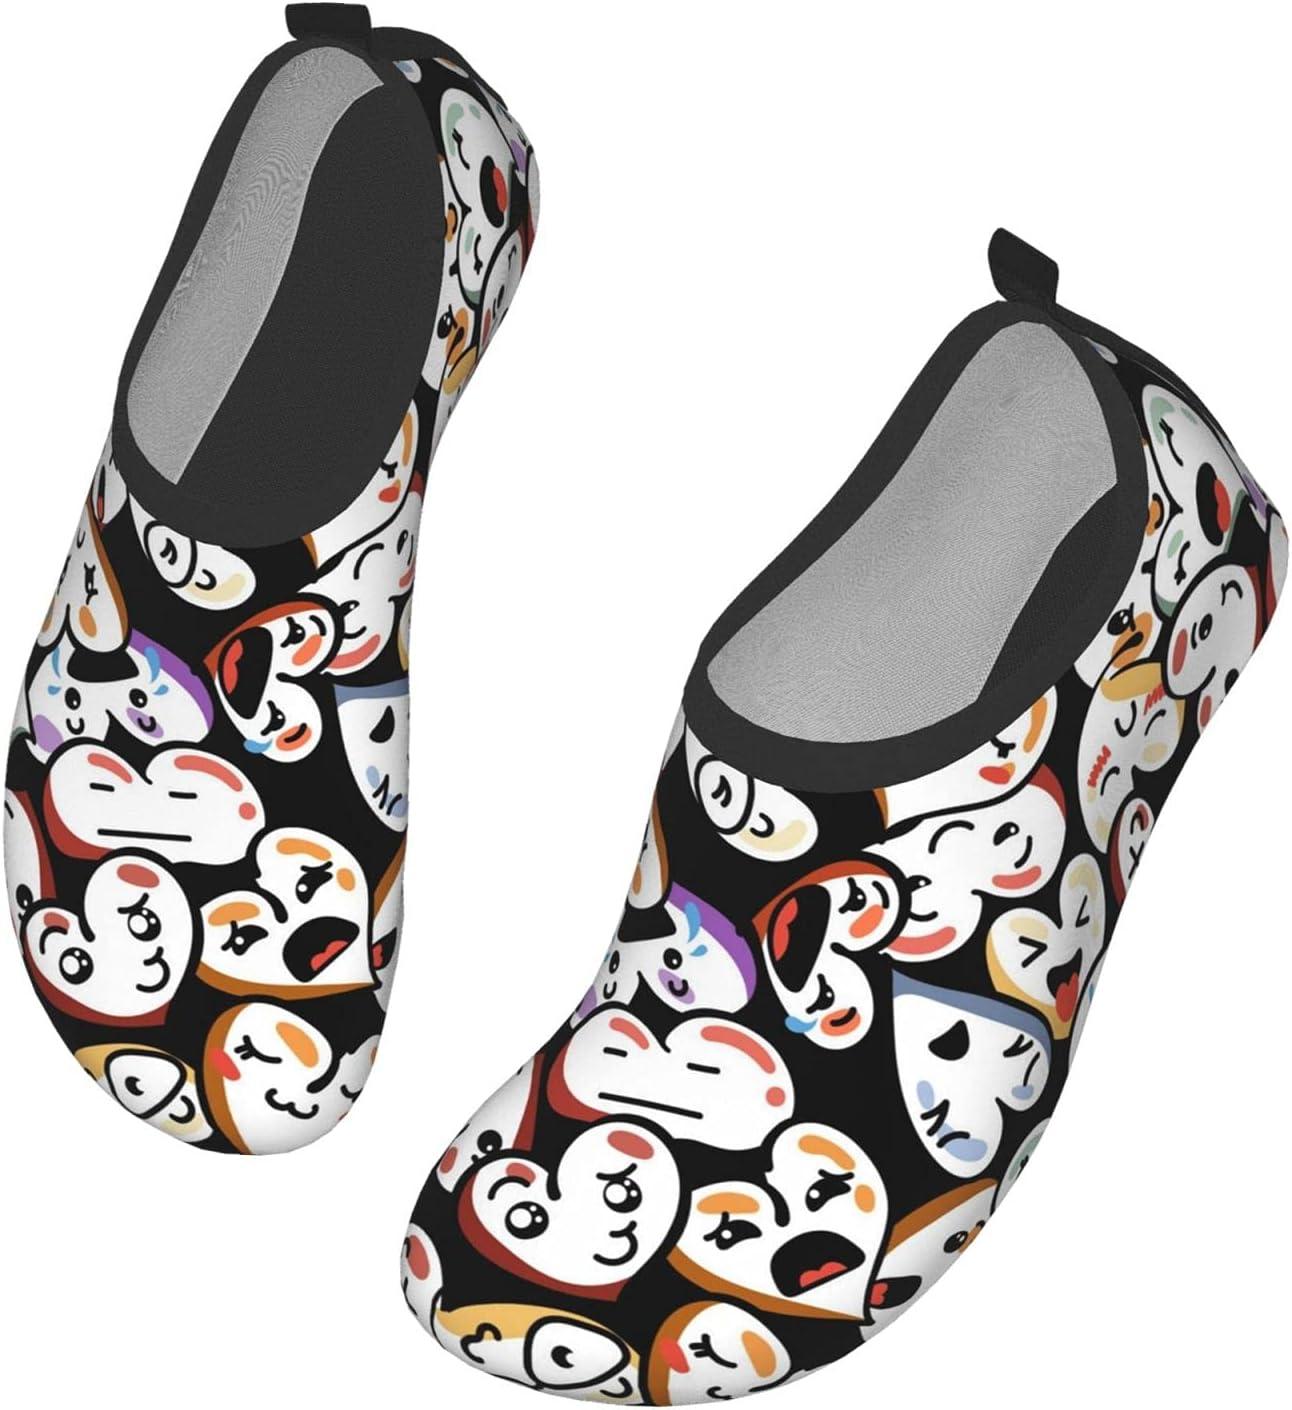 NA Cute Heart Pattern Men's Women's Water Shoes Barefoot Quick Dry Slip-On Aqua Socks for Yoga Beach Sports Swim Surf